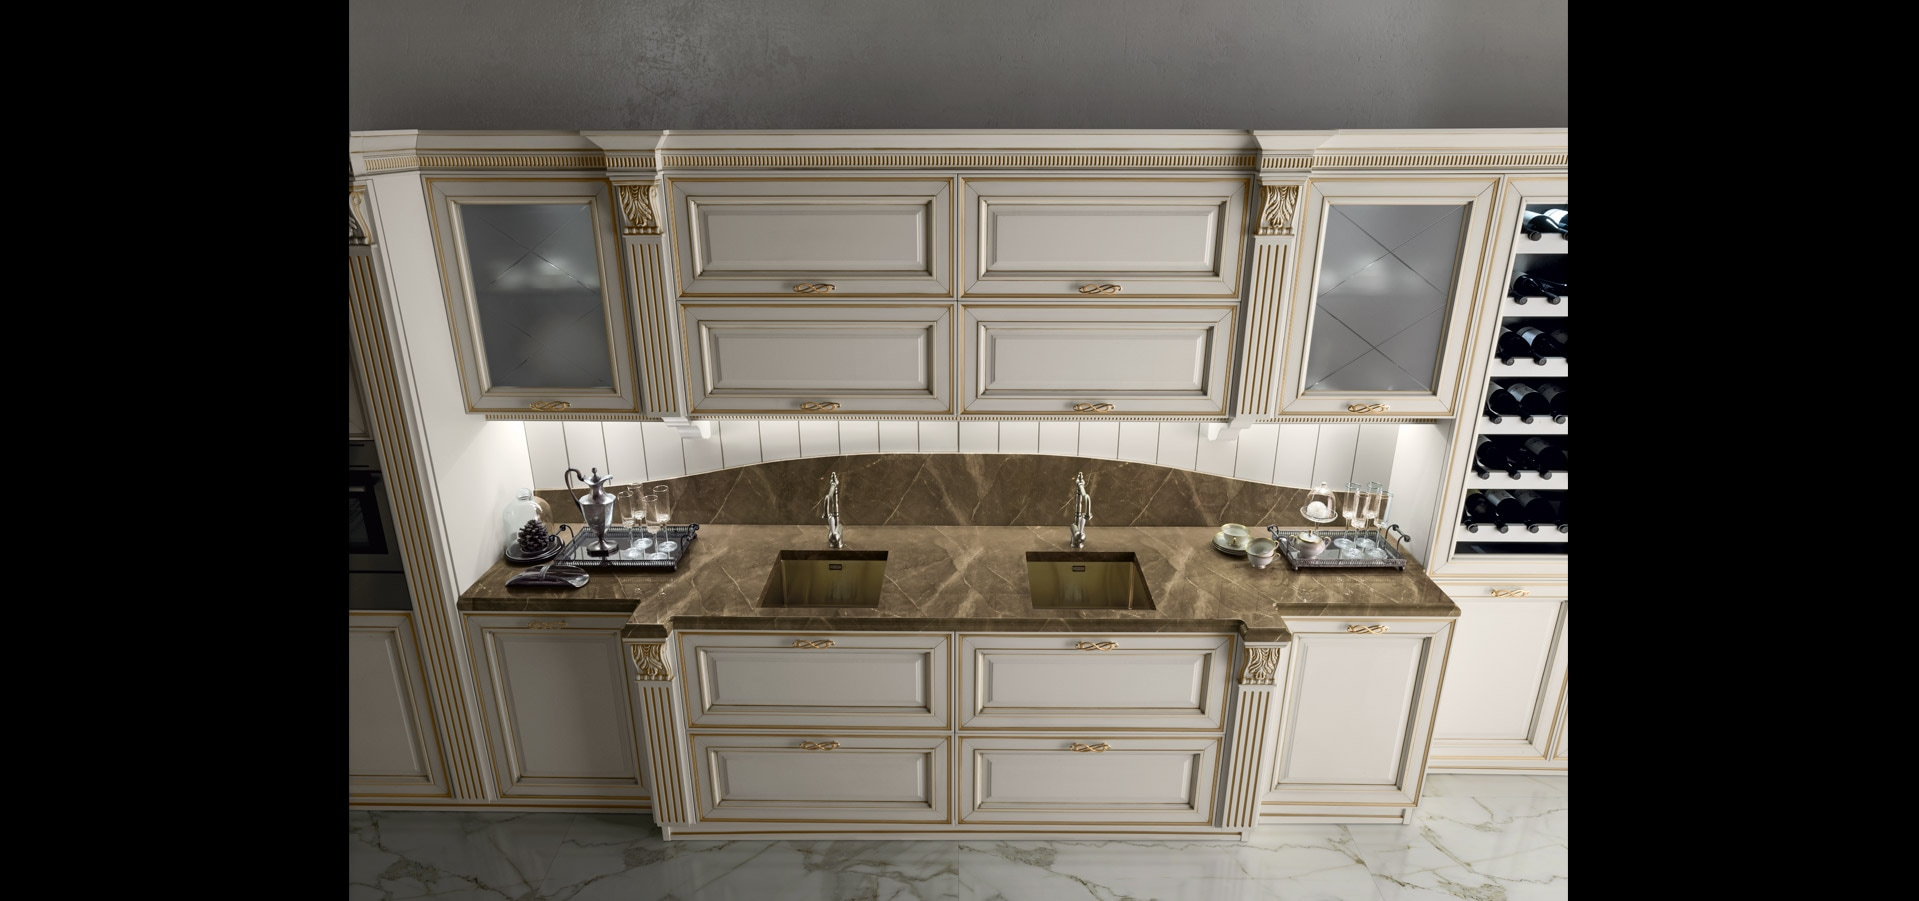 Cucina classica elegante Made in Italy | Caviar Gold | MITON Cucine